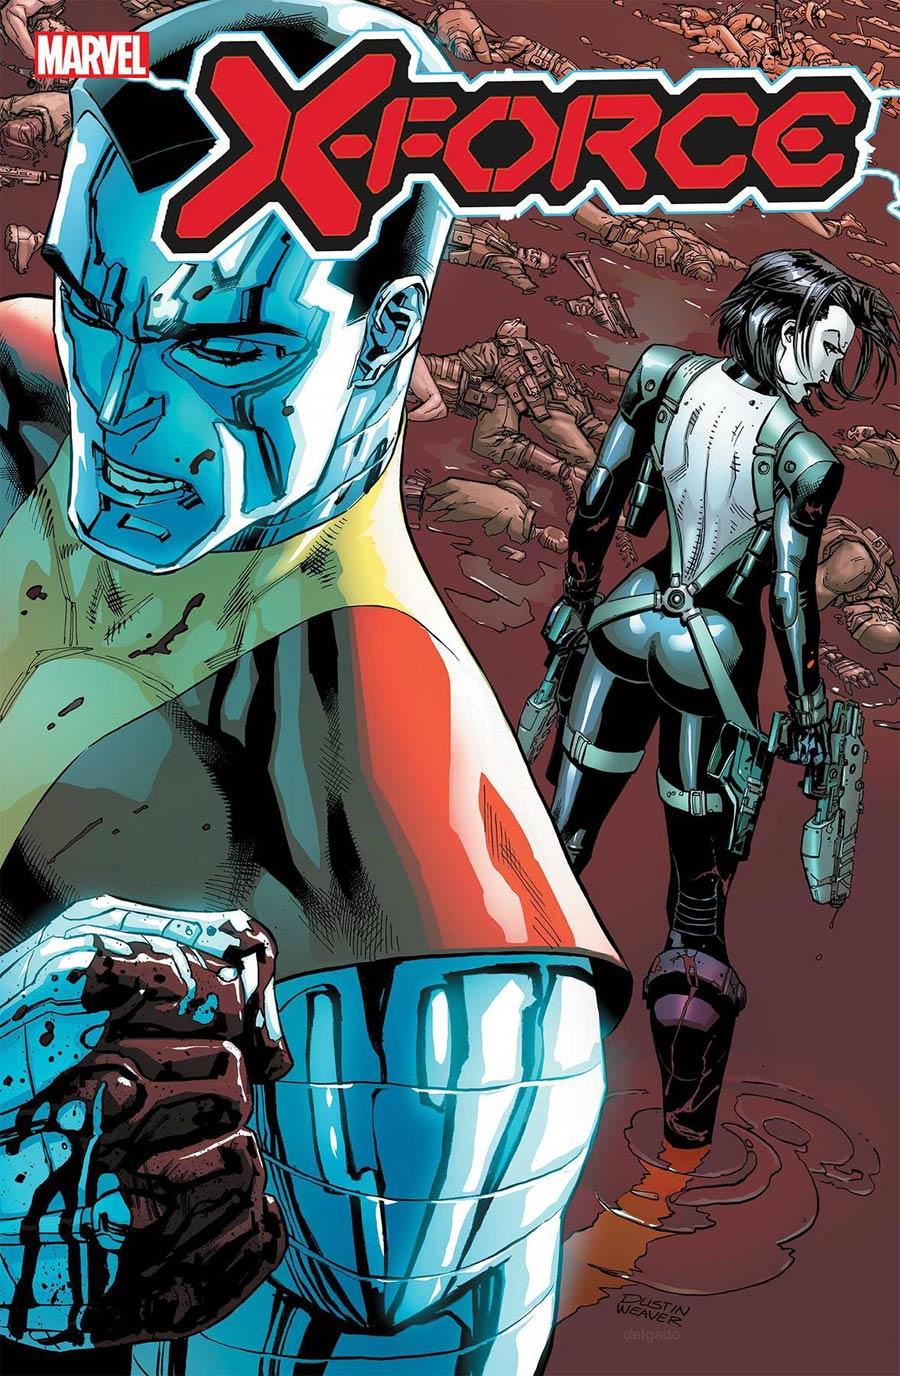 X-Force Vol 6 #8 (Dawn Of X Tie-In)